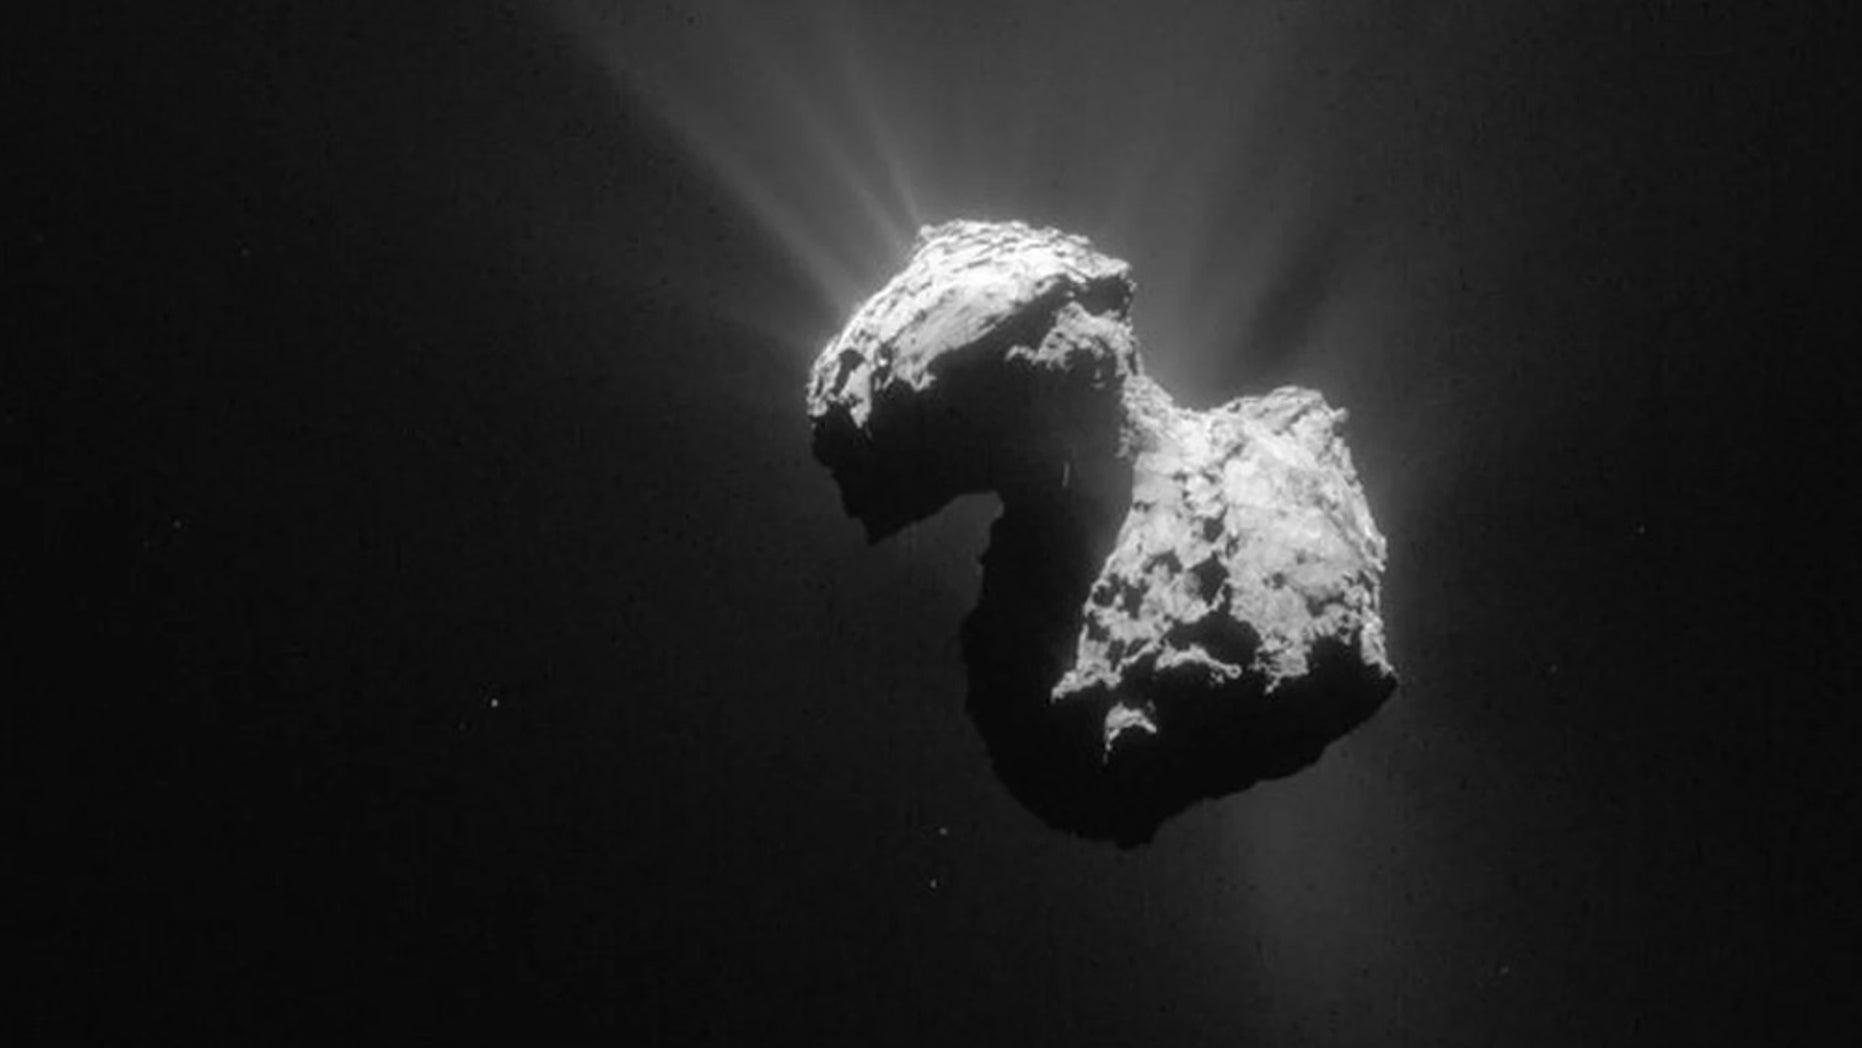 A single frame Rosetta navigation camera image of Comet 67P/Churyumov-Gerasimenko.